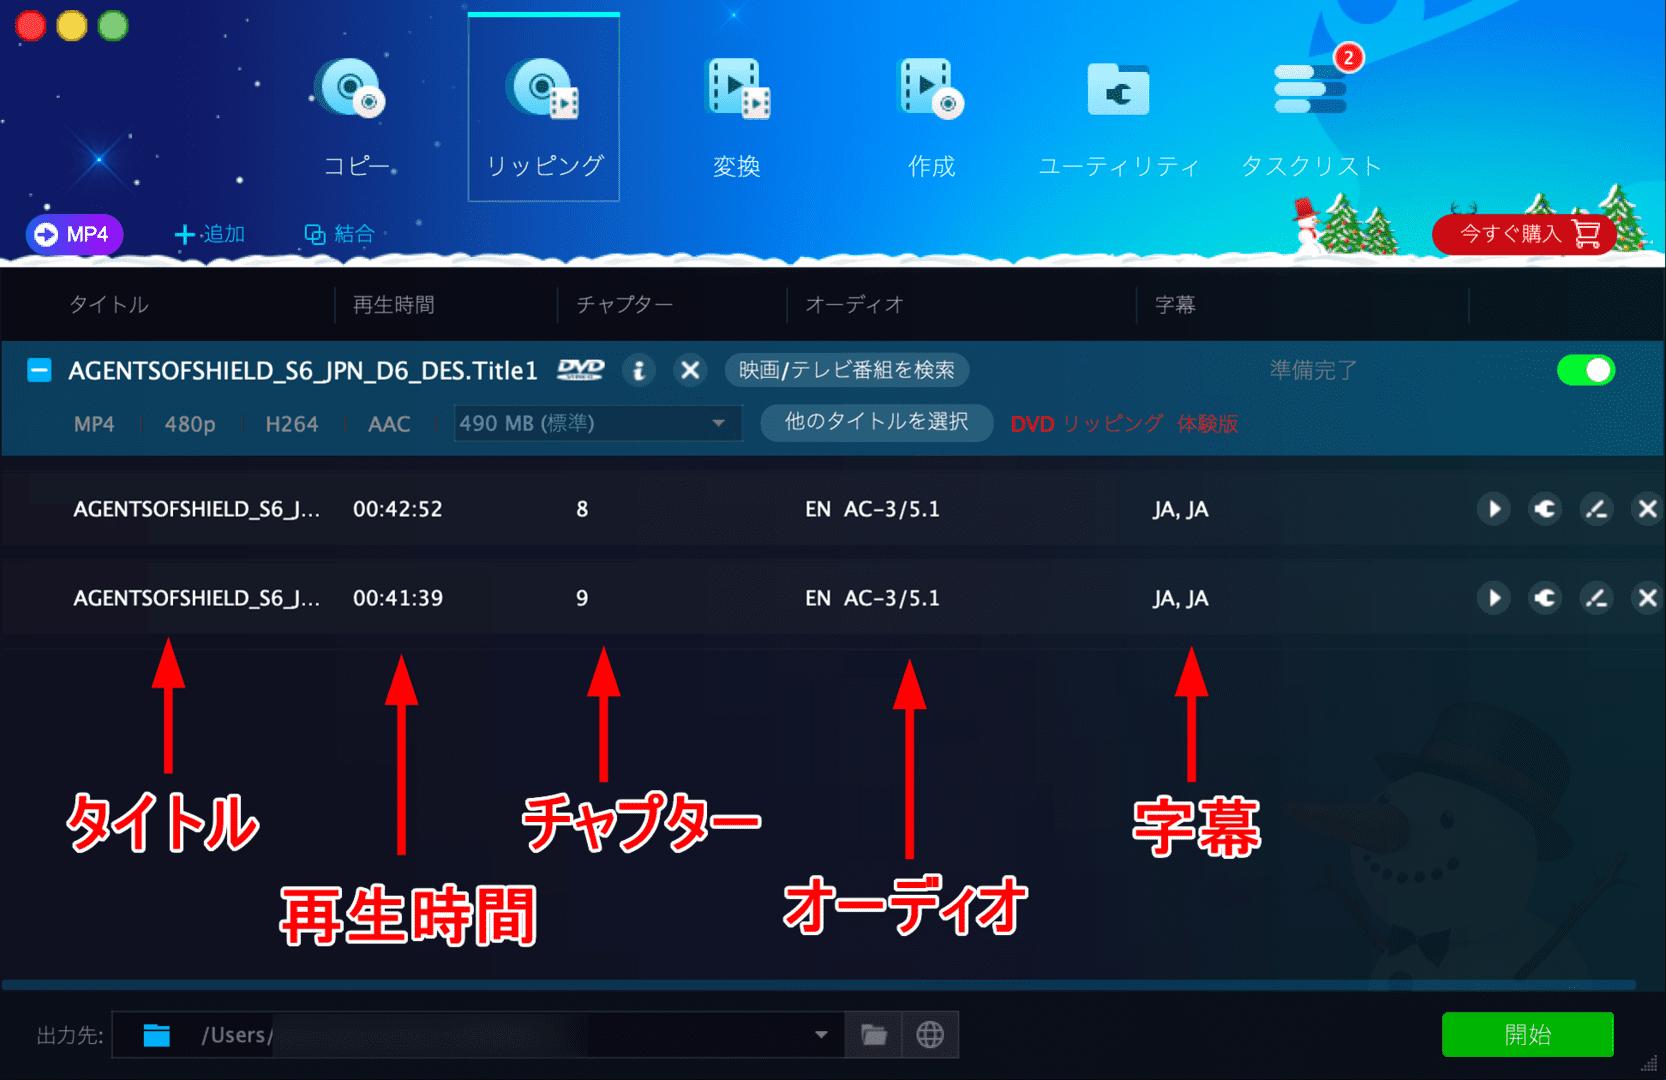 【DVDFab for macの使い方】Mac向けDVDFab無料体験版でDVDコピー!最強コピー性能を体感できるDVDFab11無料版for macの使い方|DVDからiPhoneに適した形式に変換する:続いてリッピングする各動画データの「オーディオ」「字幕」を設定しましょう。 一行ごとに表示されるデータは「タイトル」「再生時間」「チャプター」「オーディオ」「字幕」の順番に表示されています。